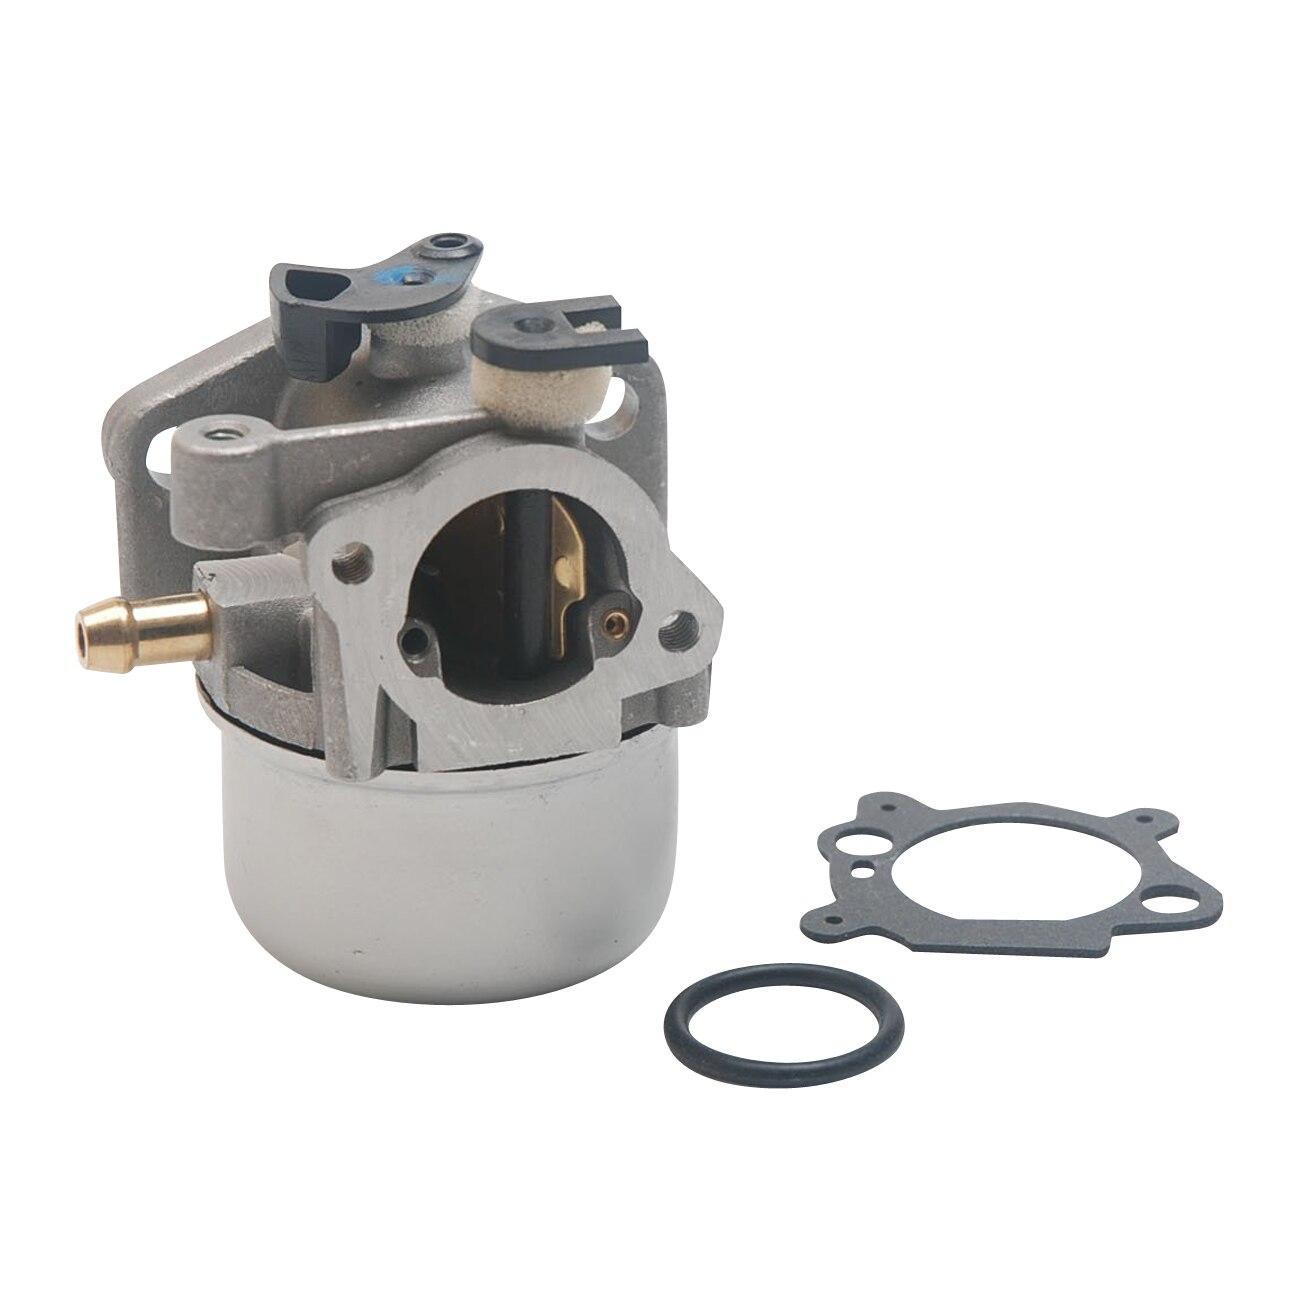 Carburetor For BRIGGS & STRATTON 794304 796707 799866 Toro Craftsman Carb craftsman